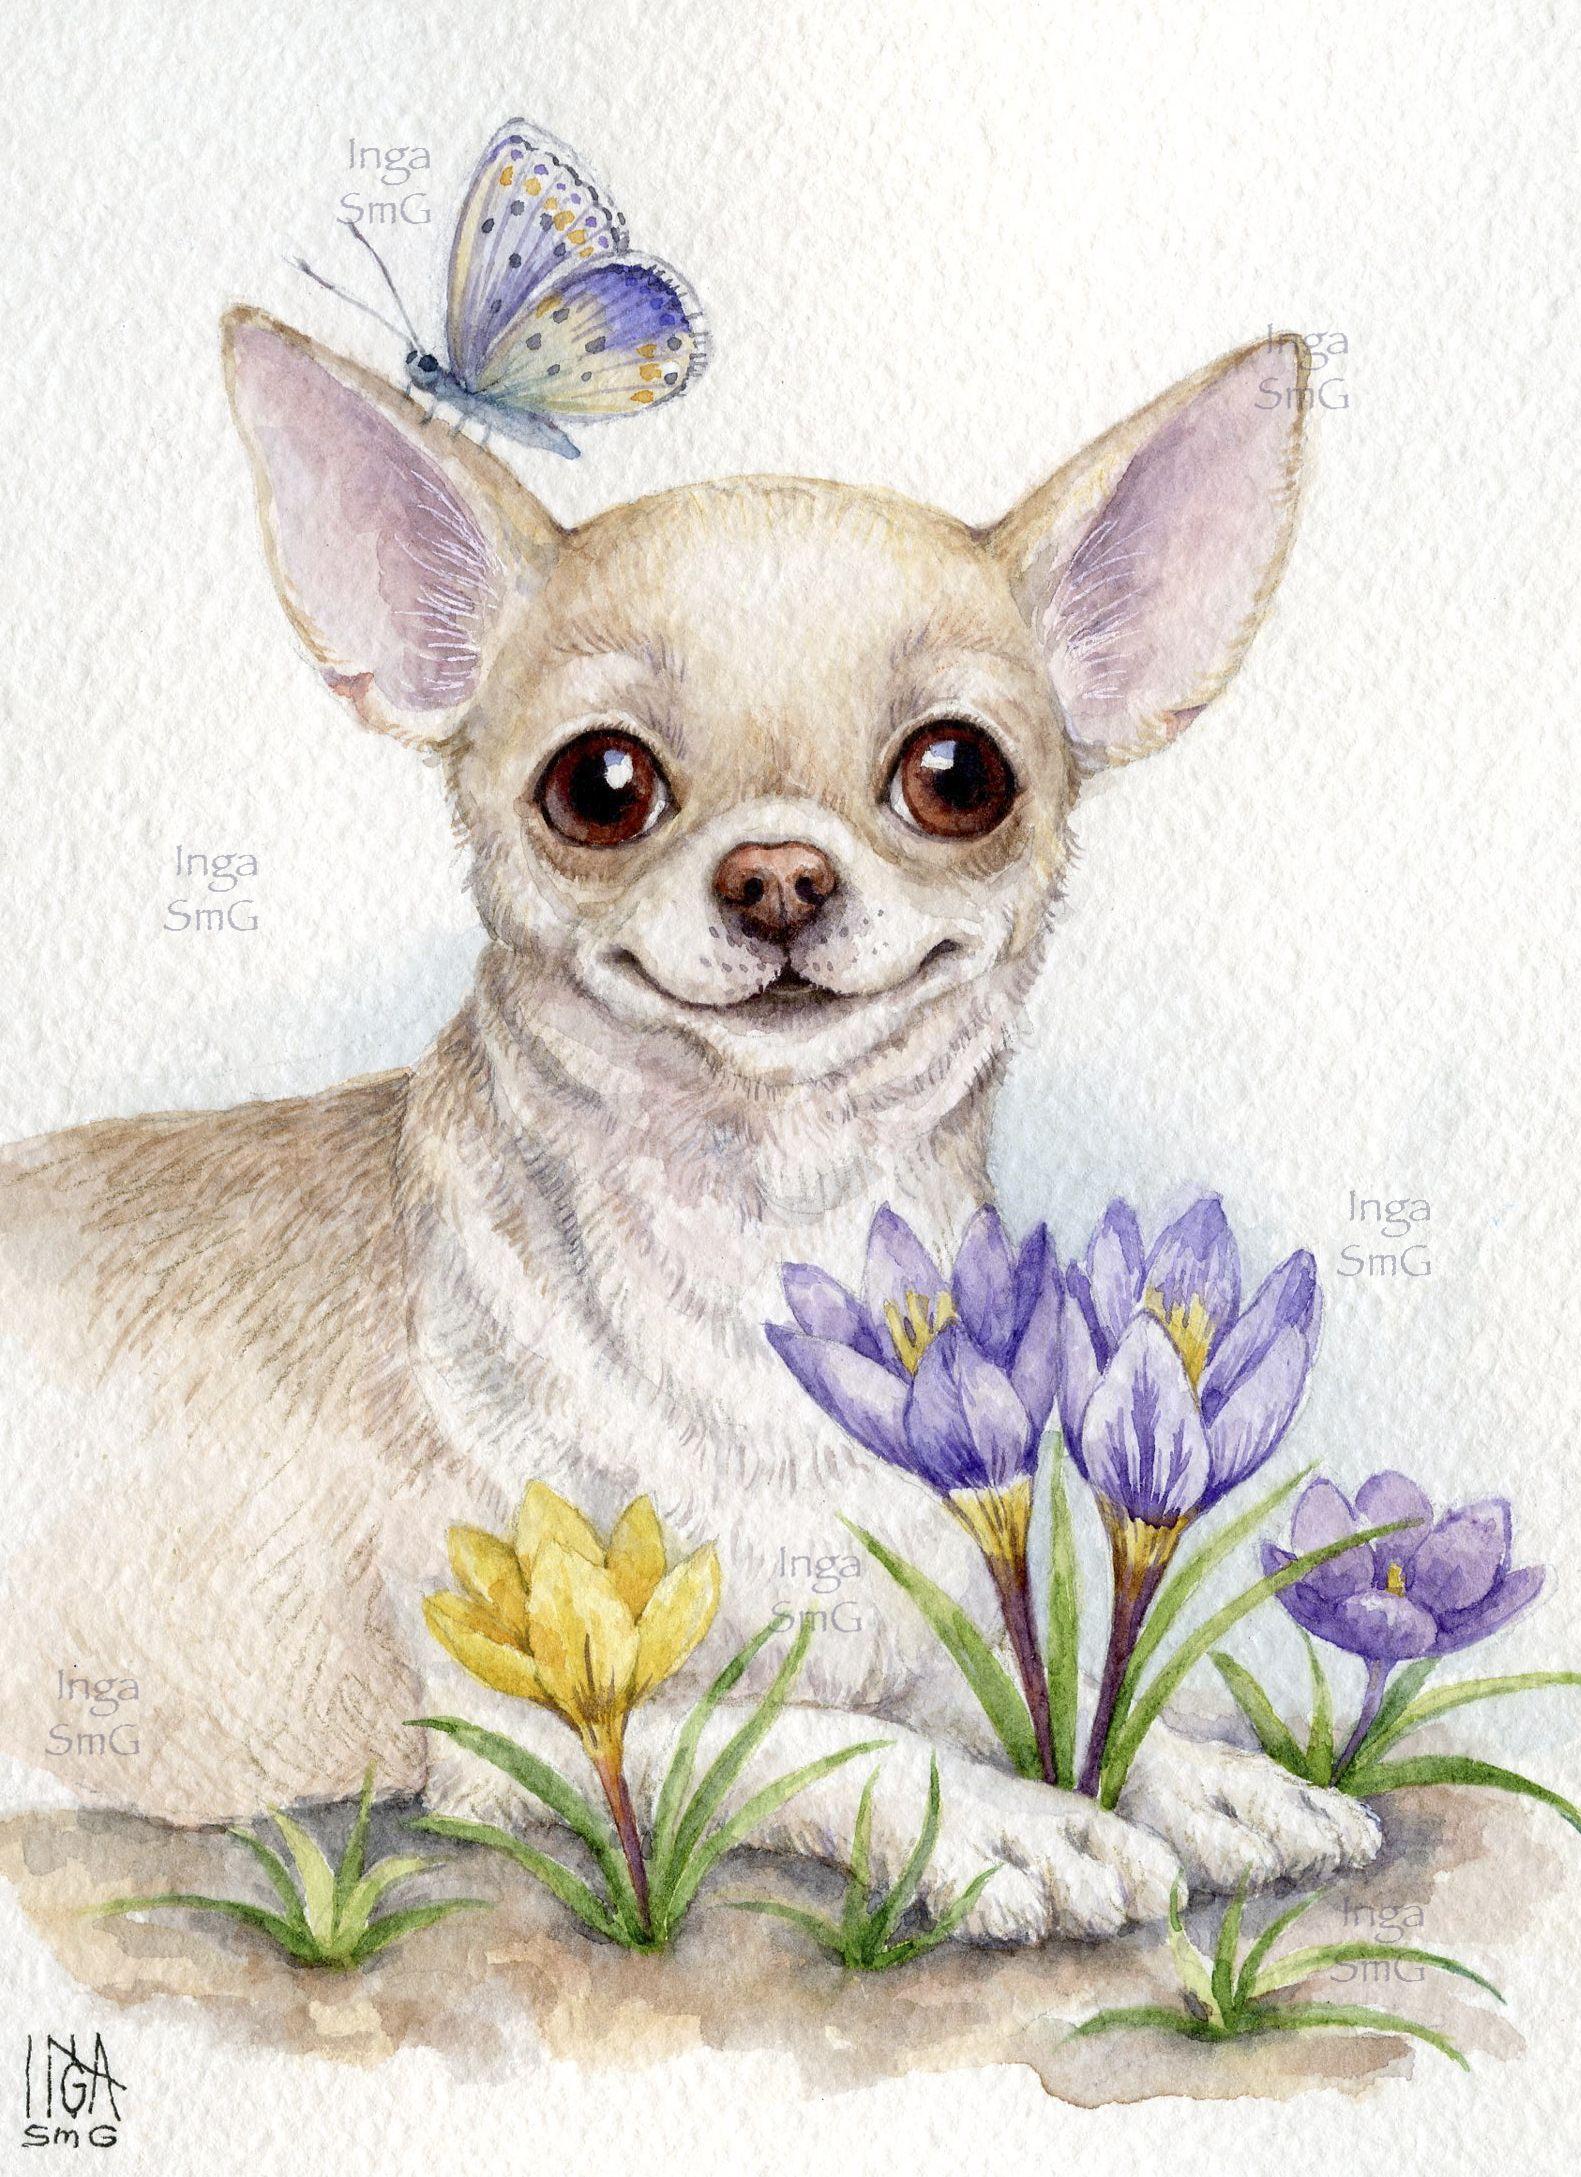 Inga Izmajlova Akvarel Sobaka Shenok Chishka Chihuahua Vesna Ulybka Inga Smg Chihuahua Art Dog Paintings Chihuahua Drawing